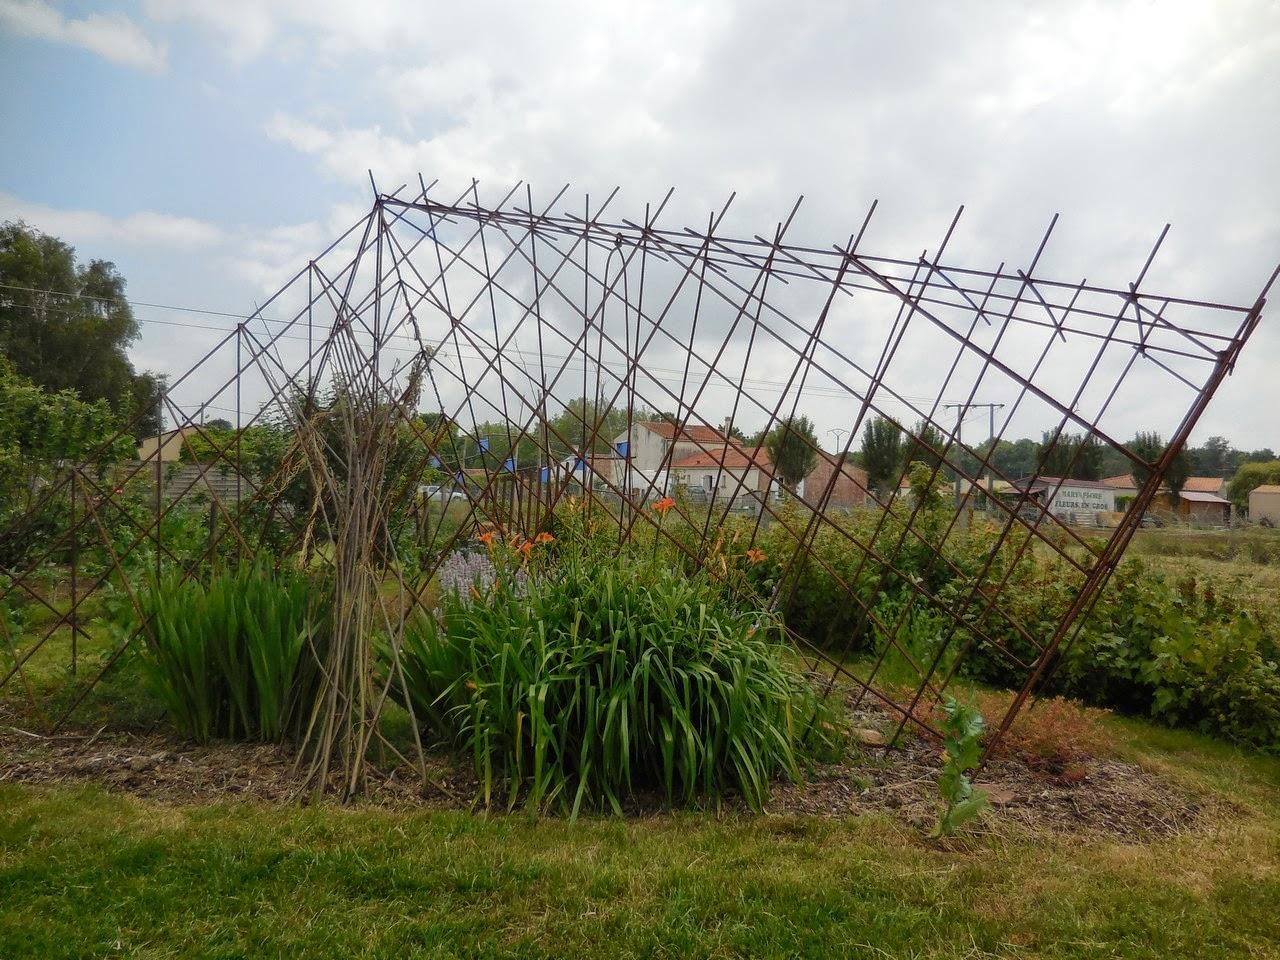 Deco Jardin Fer A Beton - Cagouille's Garden - Visite de jardin - Le Jardin de La Couture !